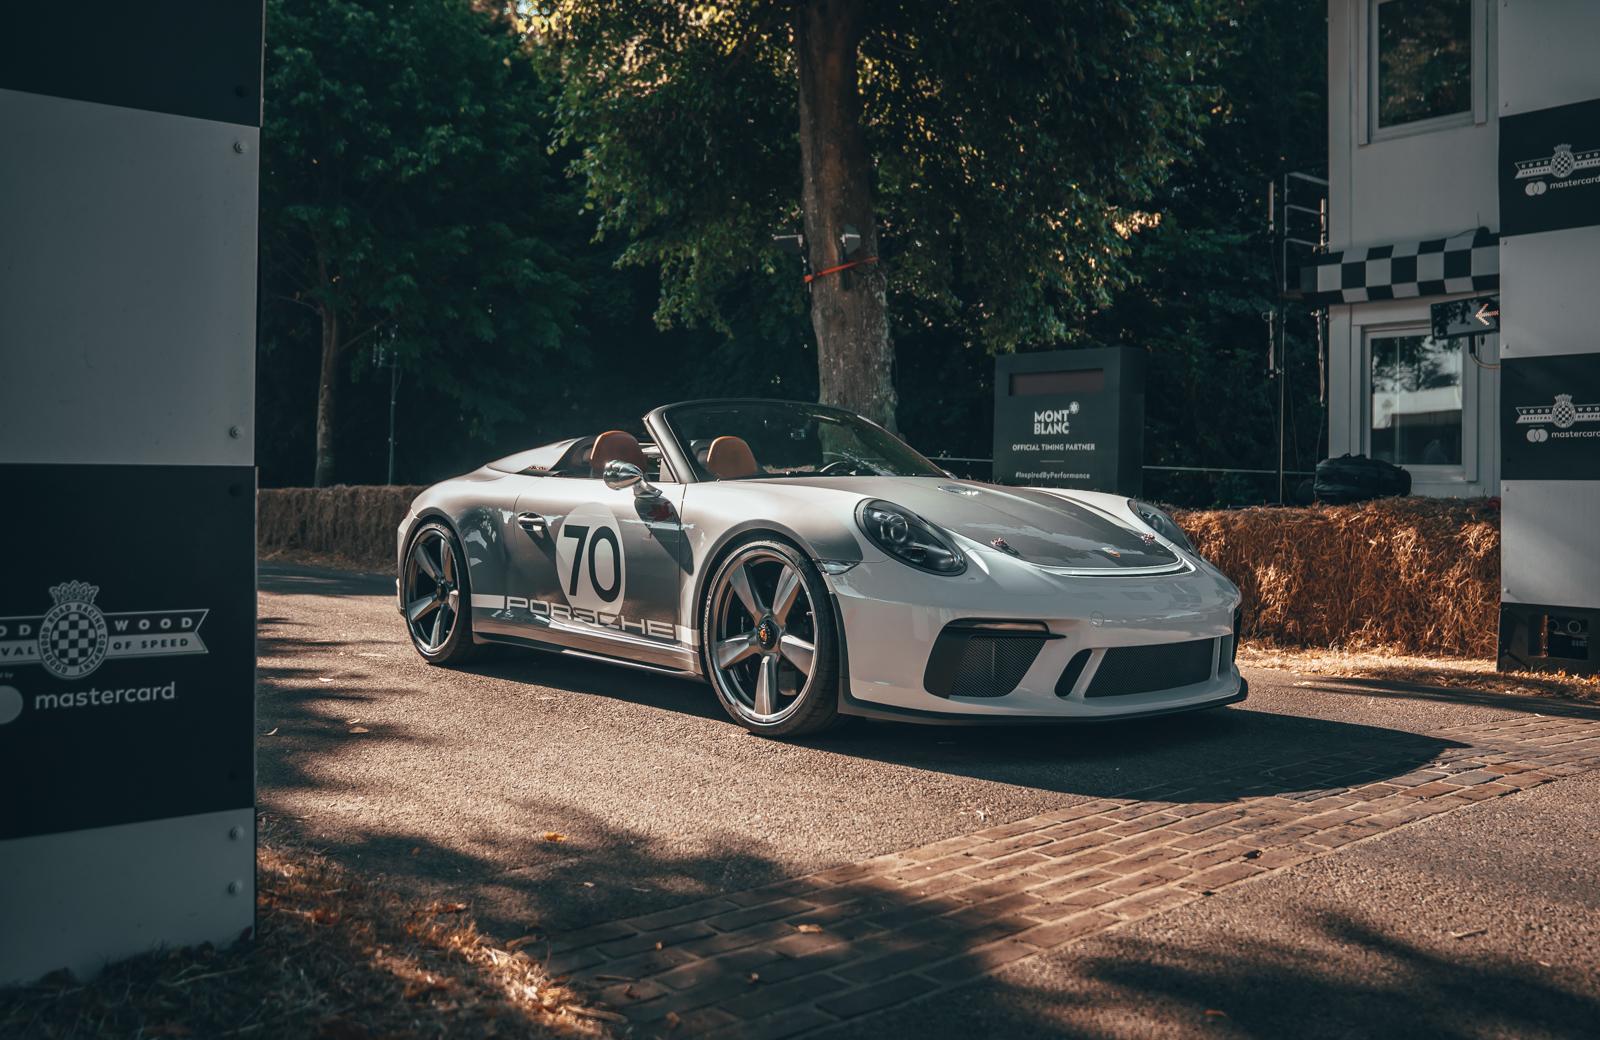 RP - Porsche Goodwood Fesitval of Speed 70 Years 2018-13.jpg